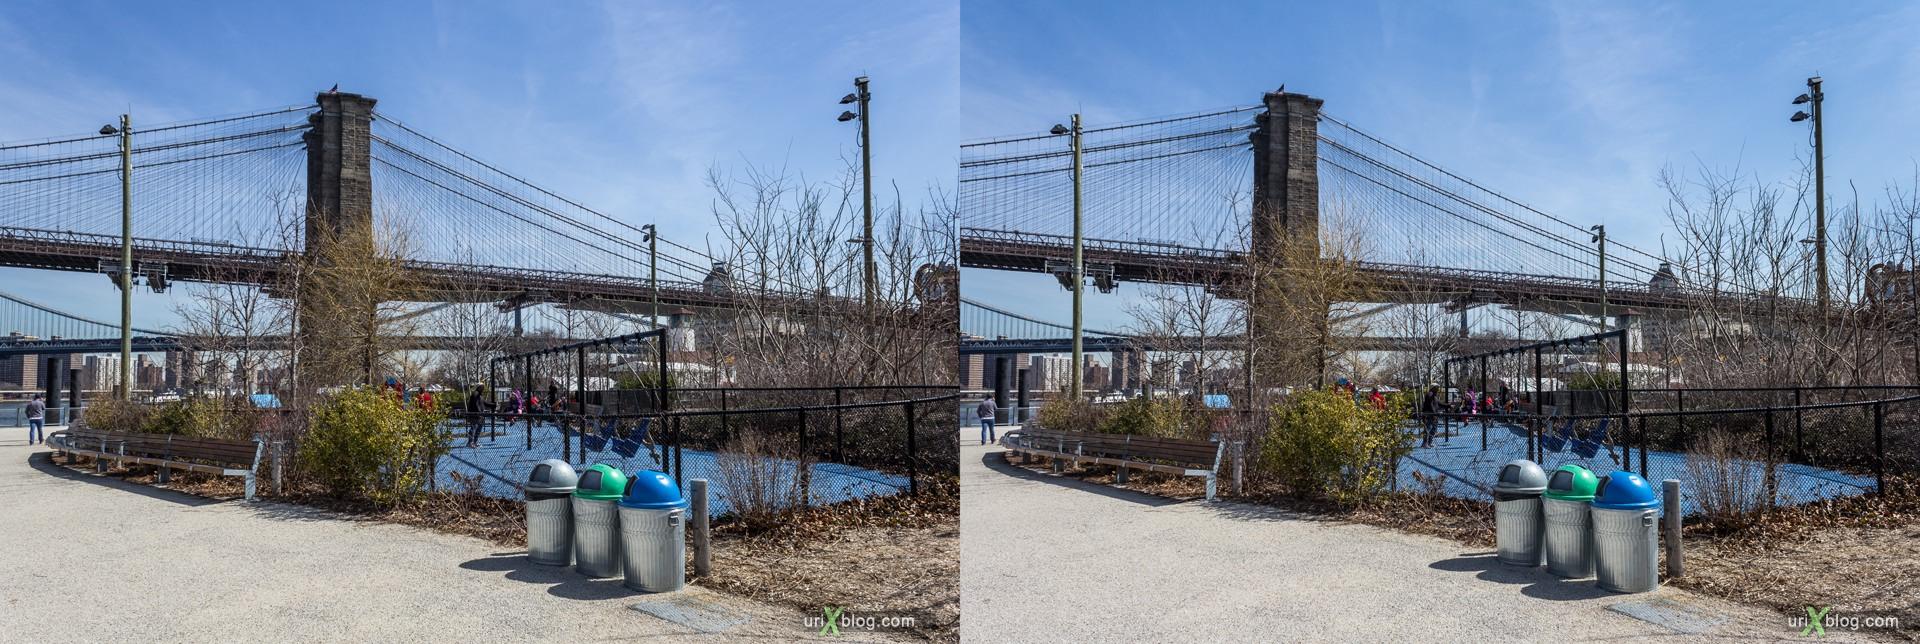 2013, Brooklyn Bridge парк, Бруклин, Нью-Йорк, США, 3D, перекрёстные стереопары, стерео, стереопара, стереопары